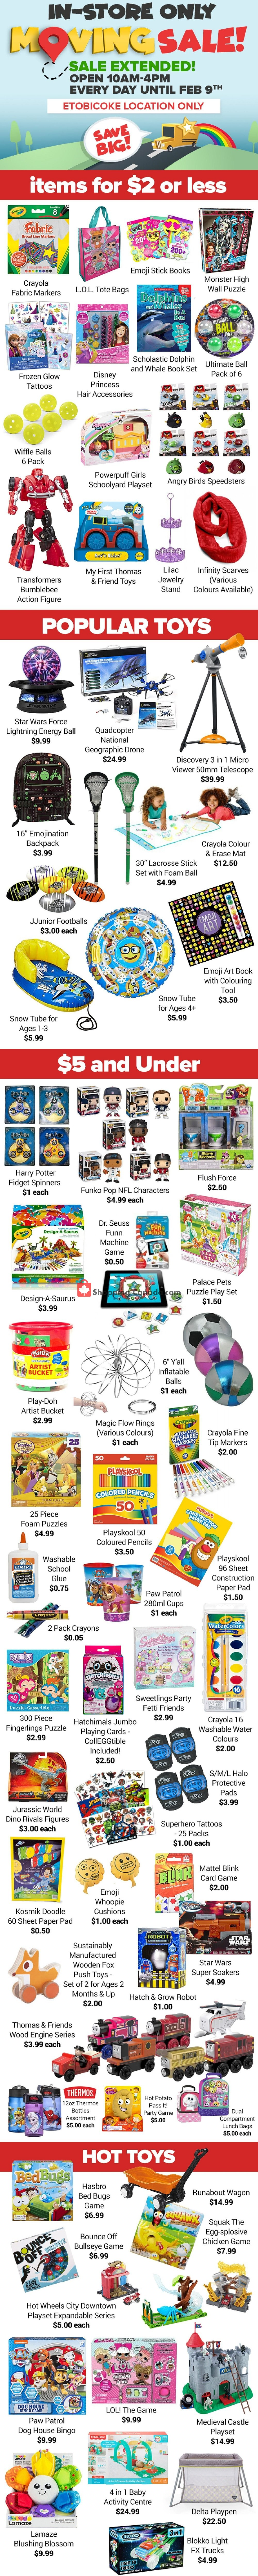 Flyer Samko and Miko Toy Warehouse Canada - from Wednesday January 29, 2020 to Sunday February 9, 2020